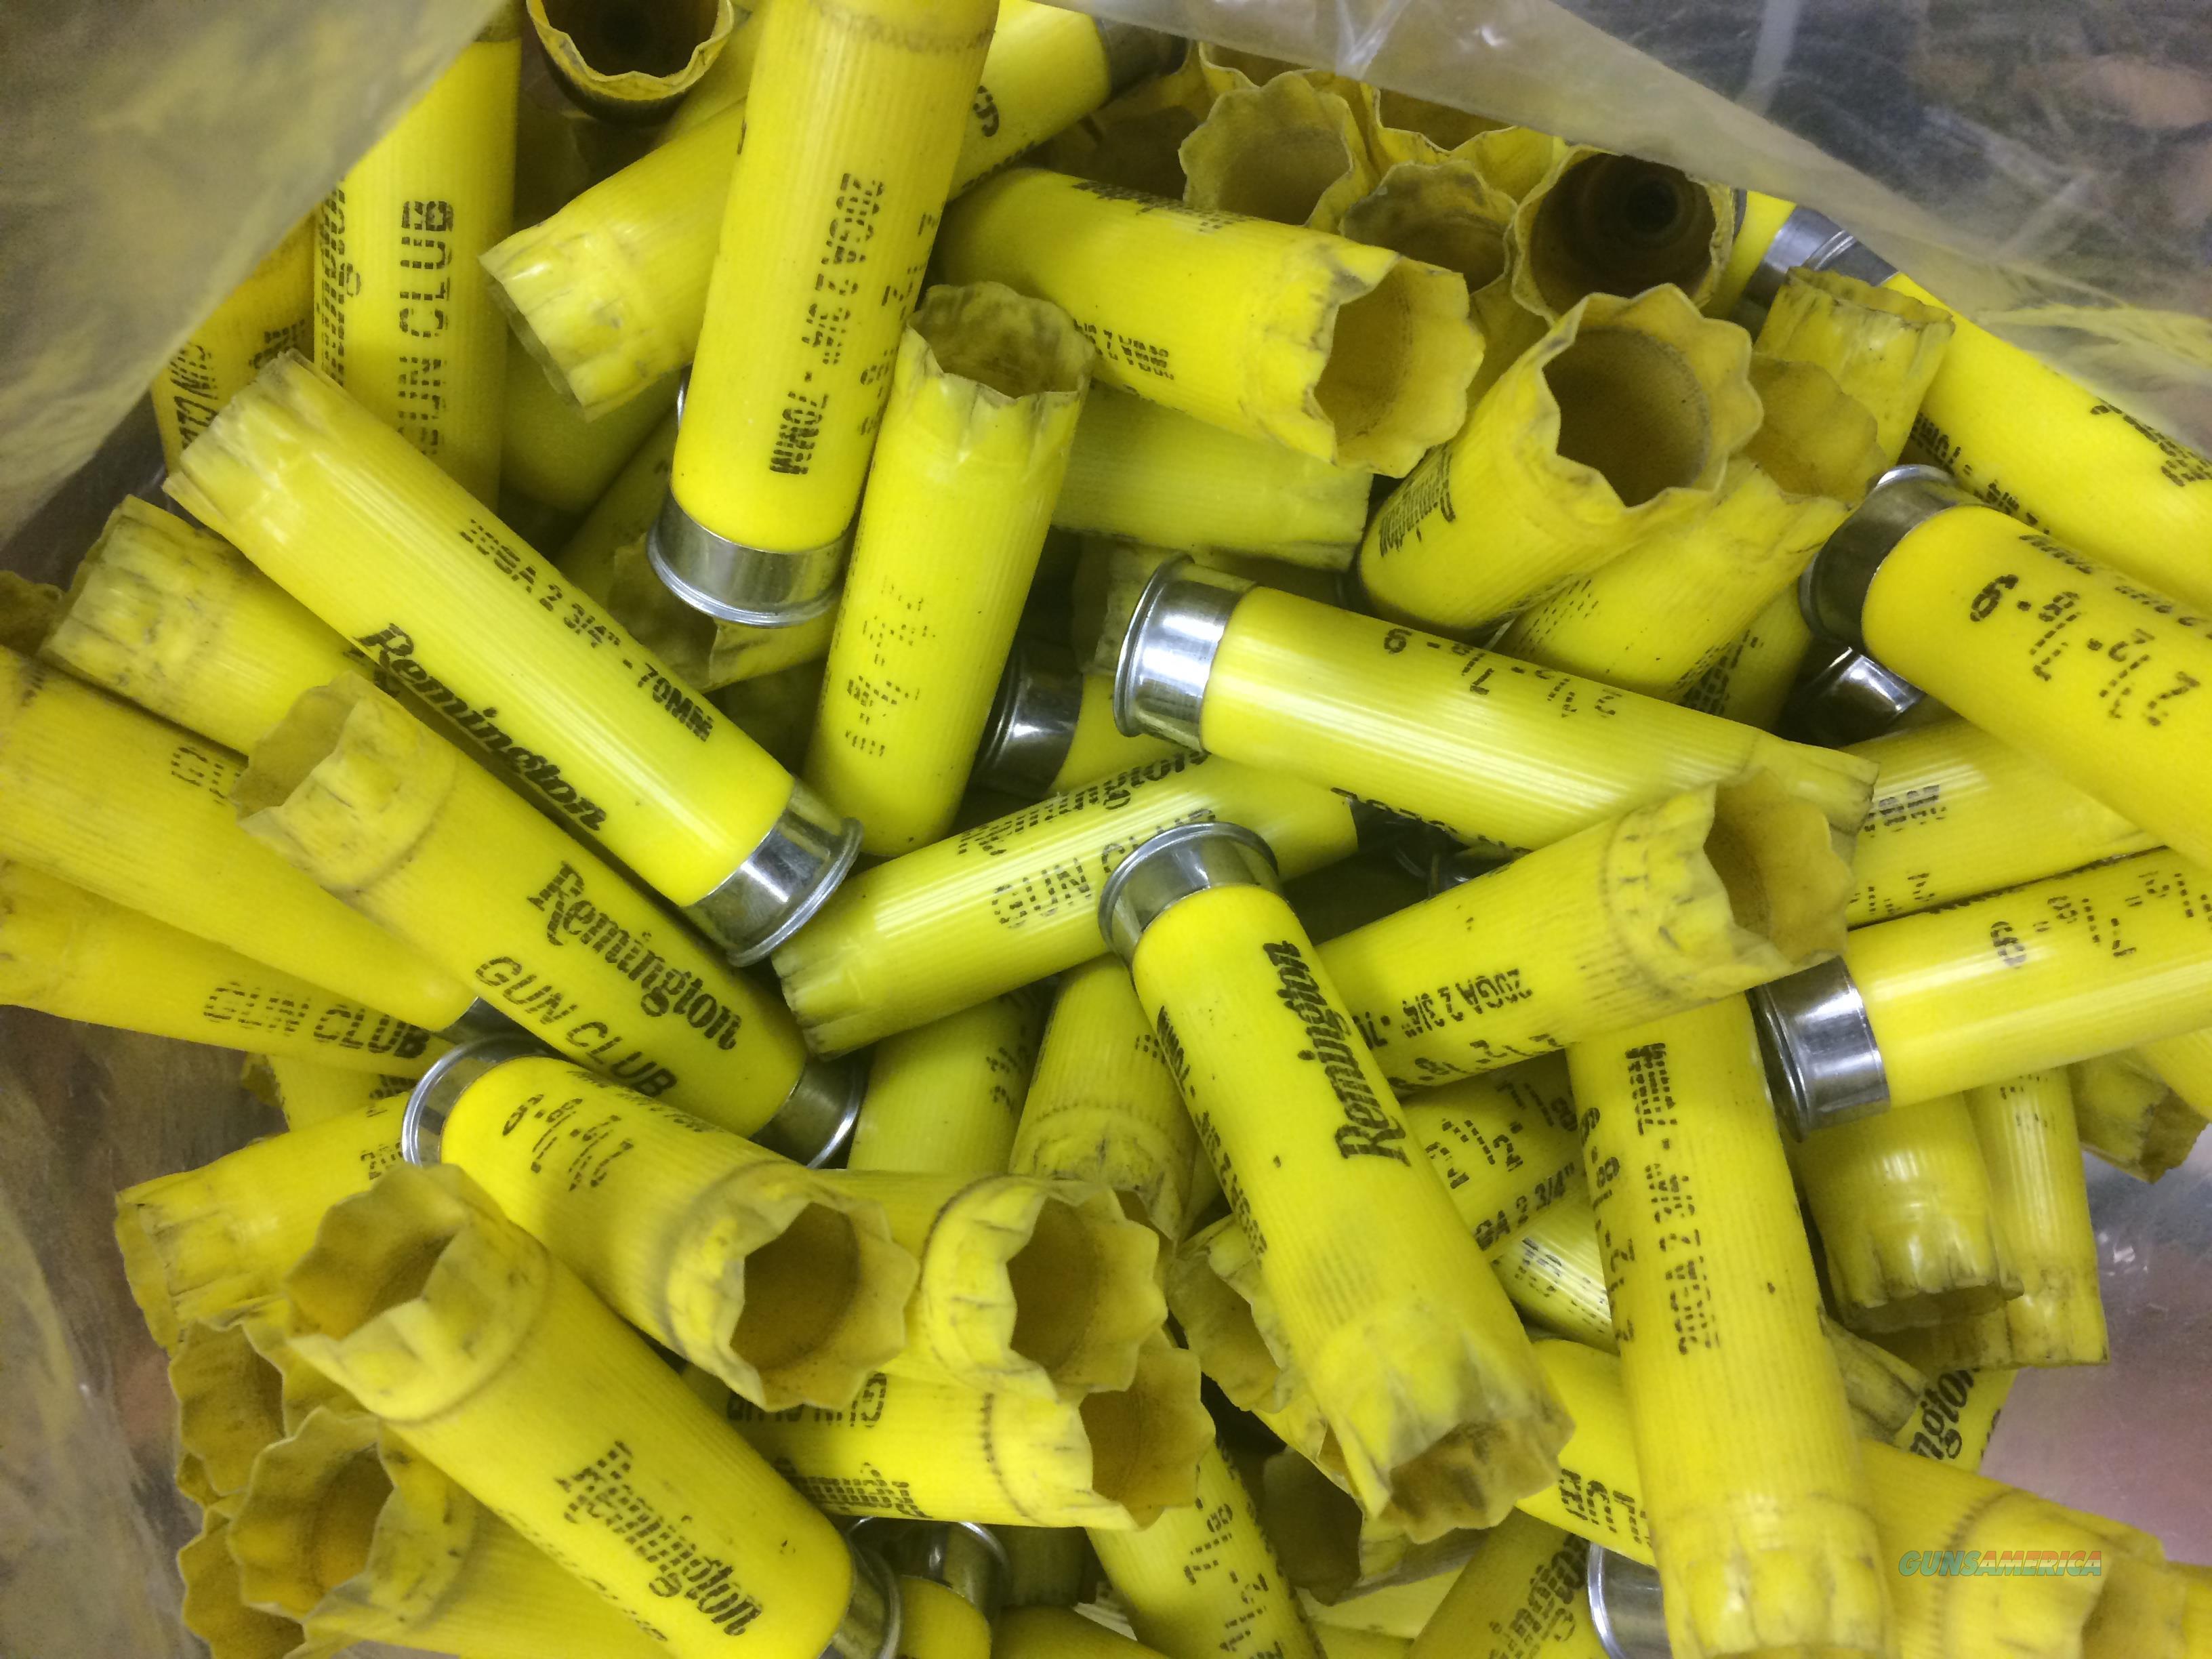 300 Remington Gun Club Free Shipping 20ga not STS or Winchester AA HS hulls  Non-Guns > Reloading > Components > Shotshell